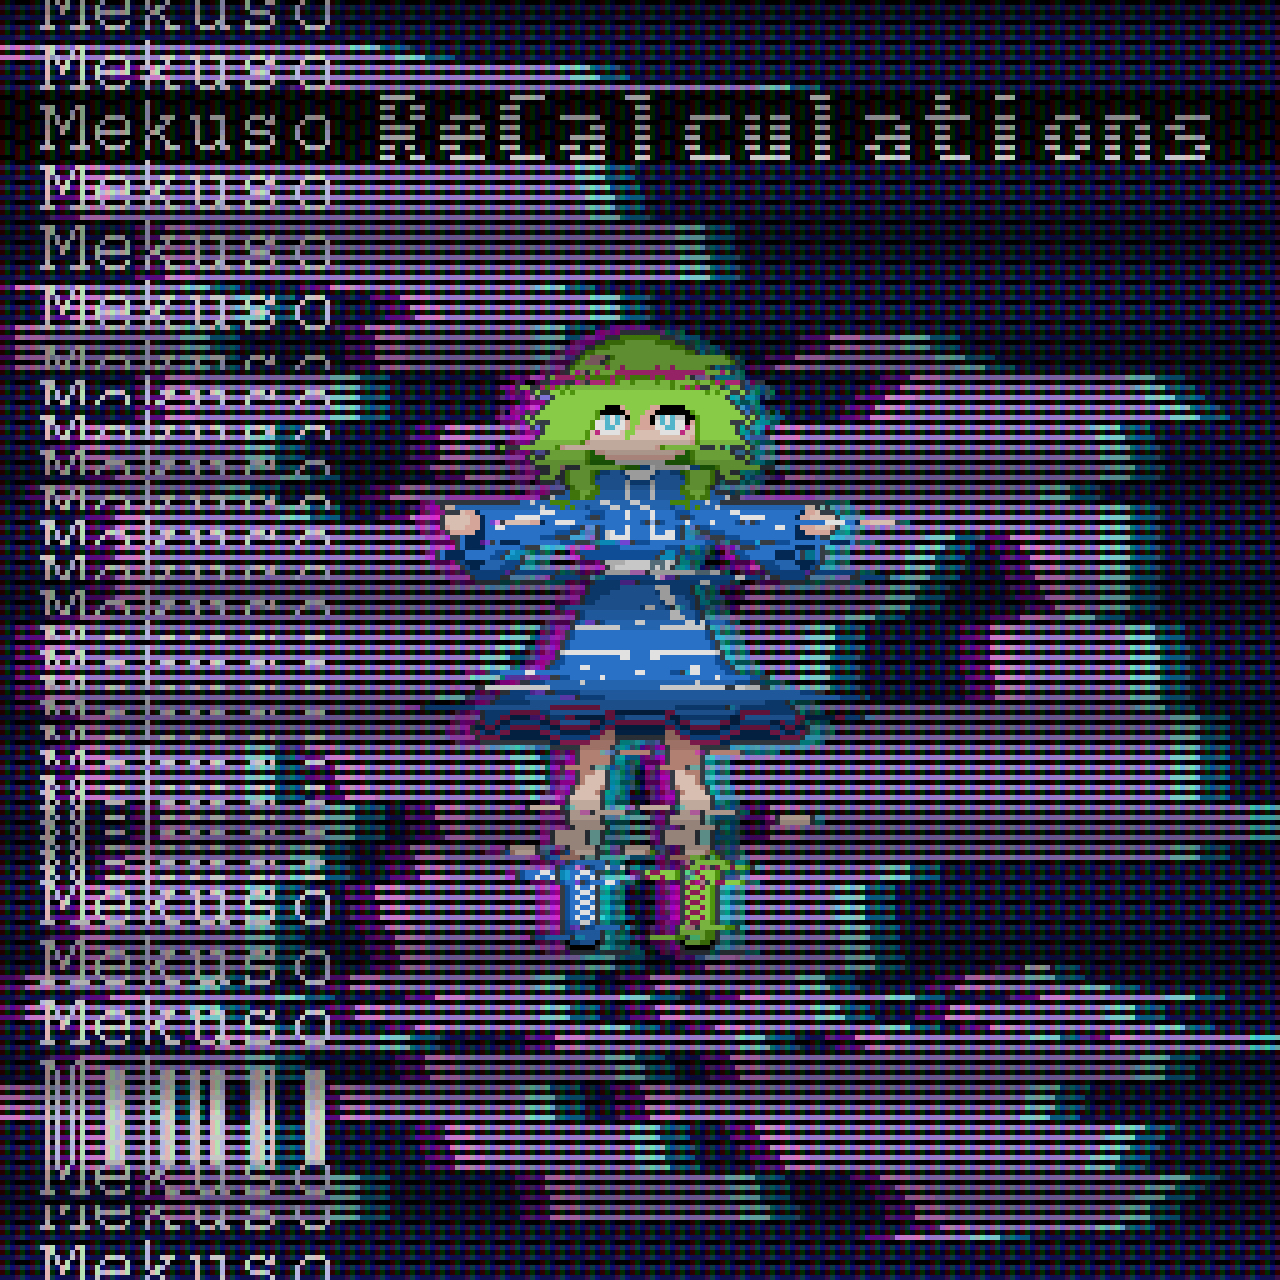 ReCalculations